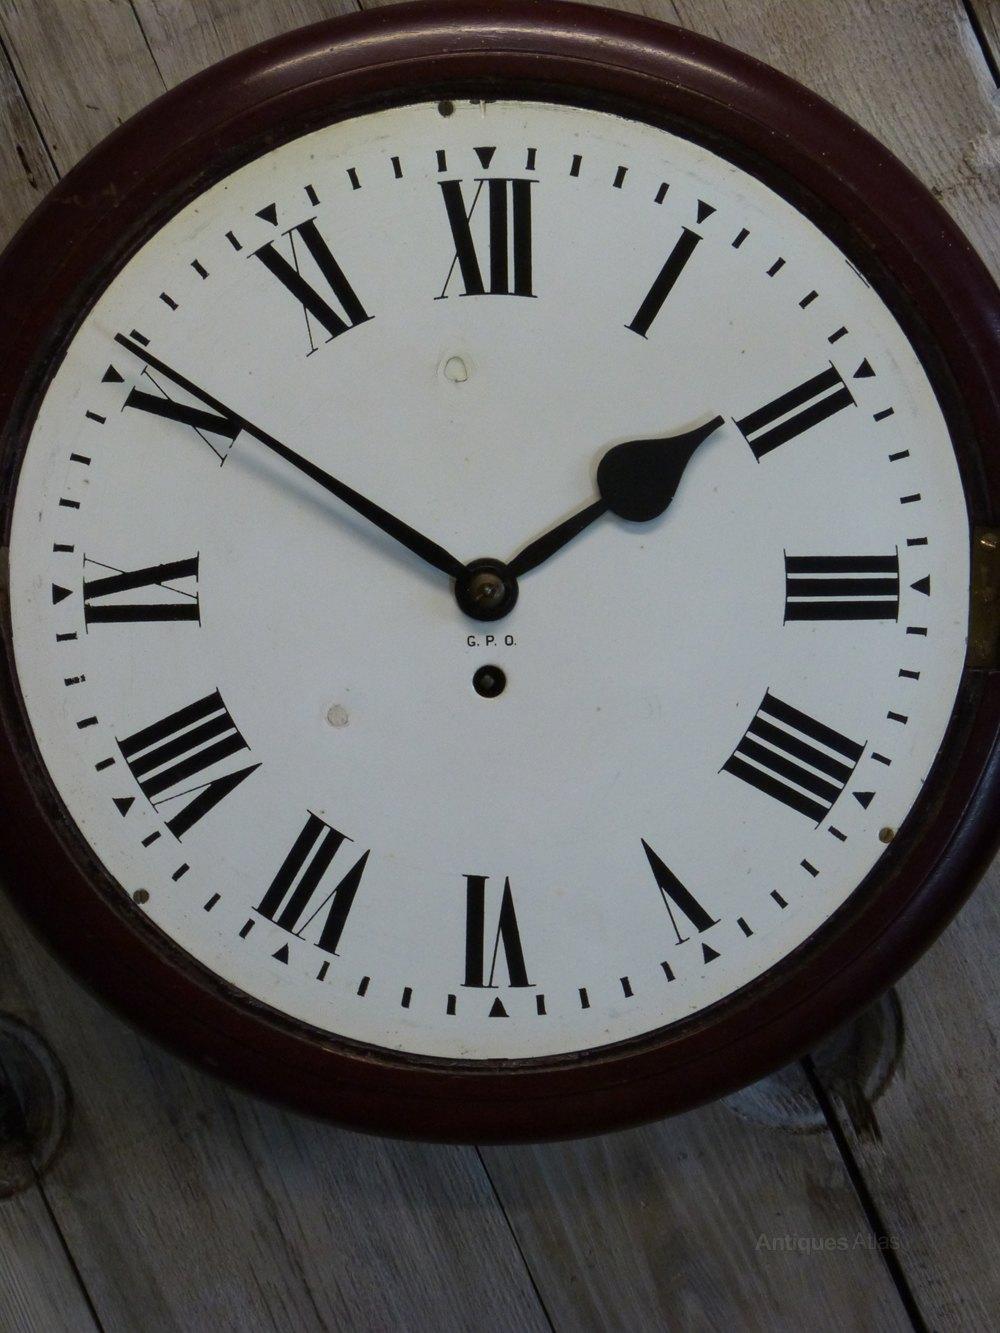 Antiques Atlas G P O Fusee Wall Clock